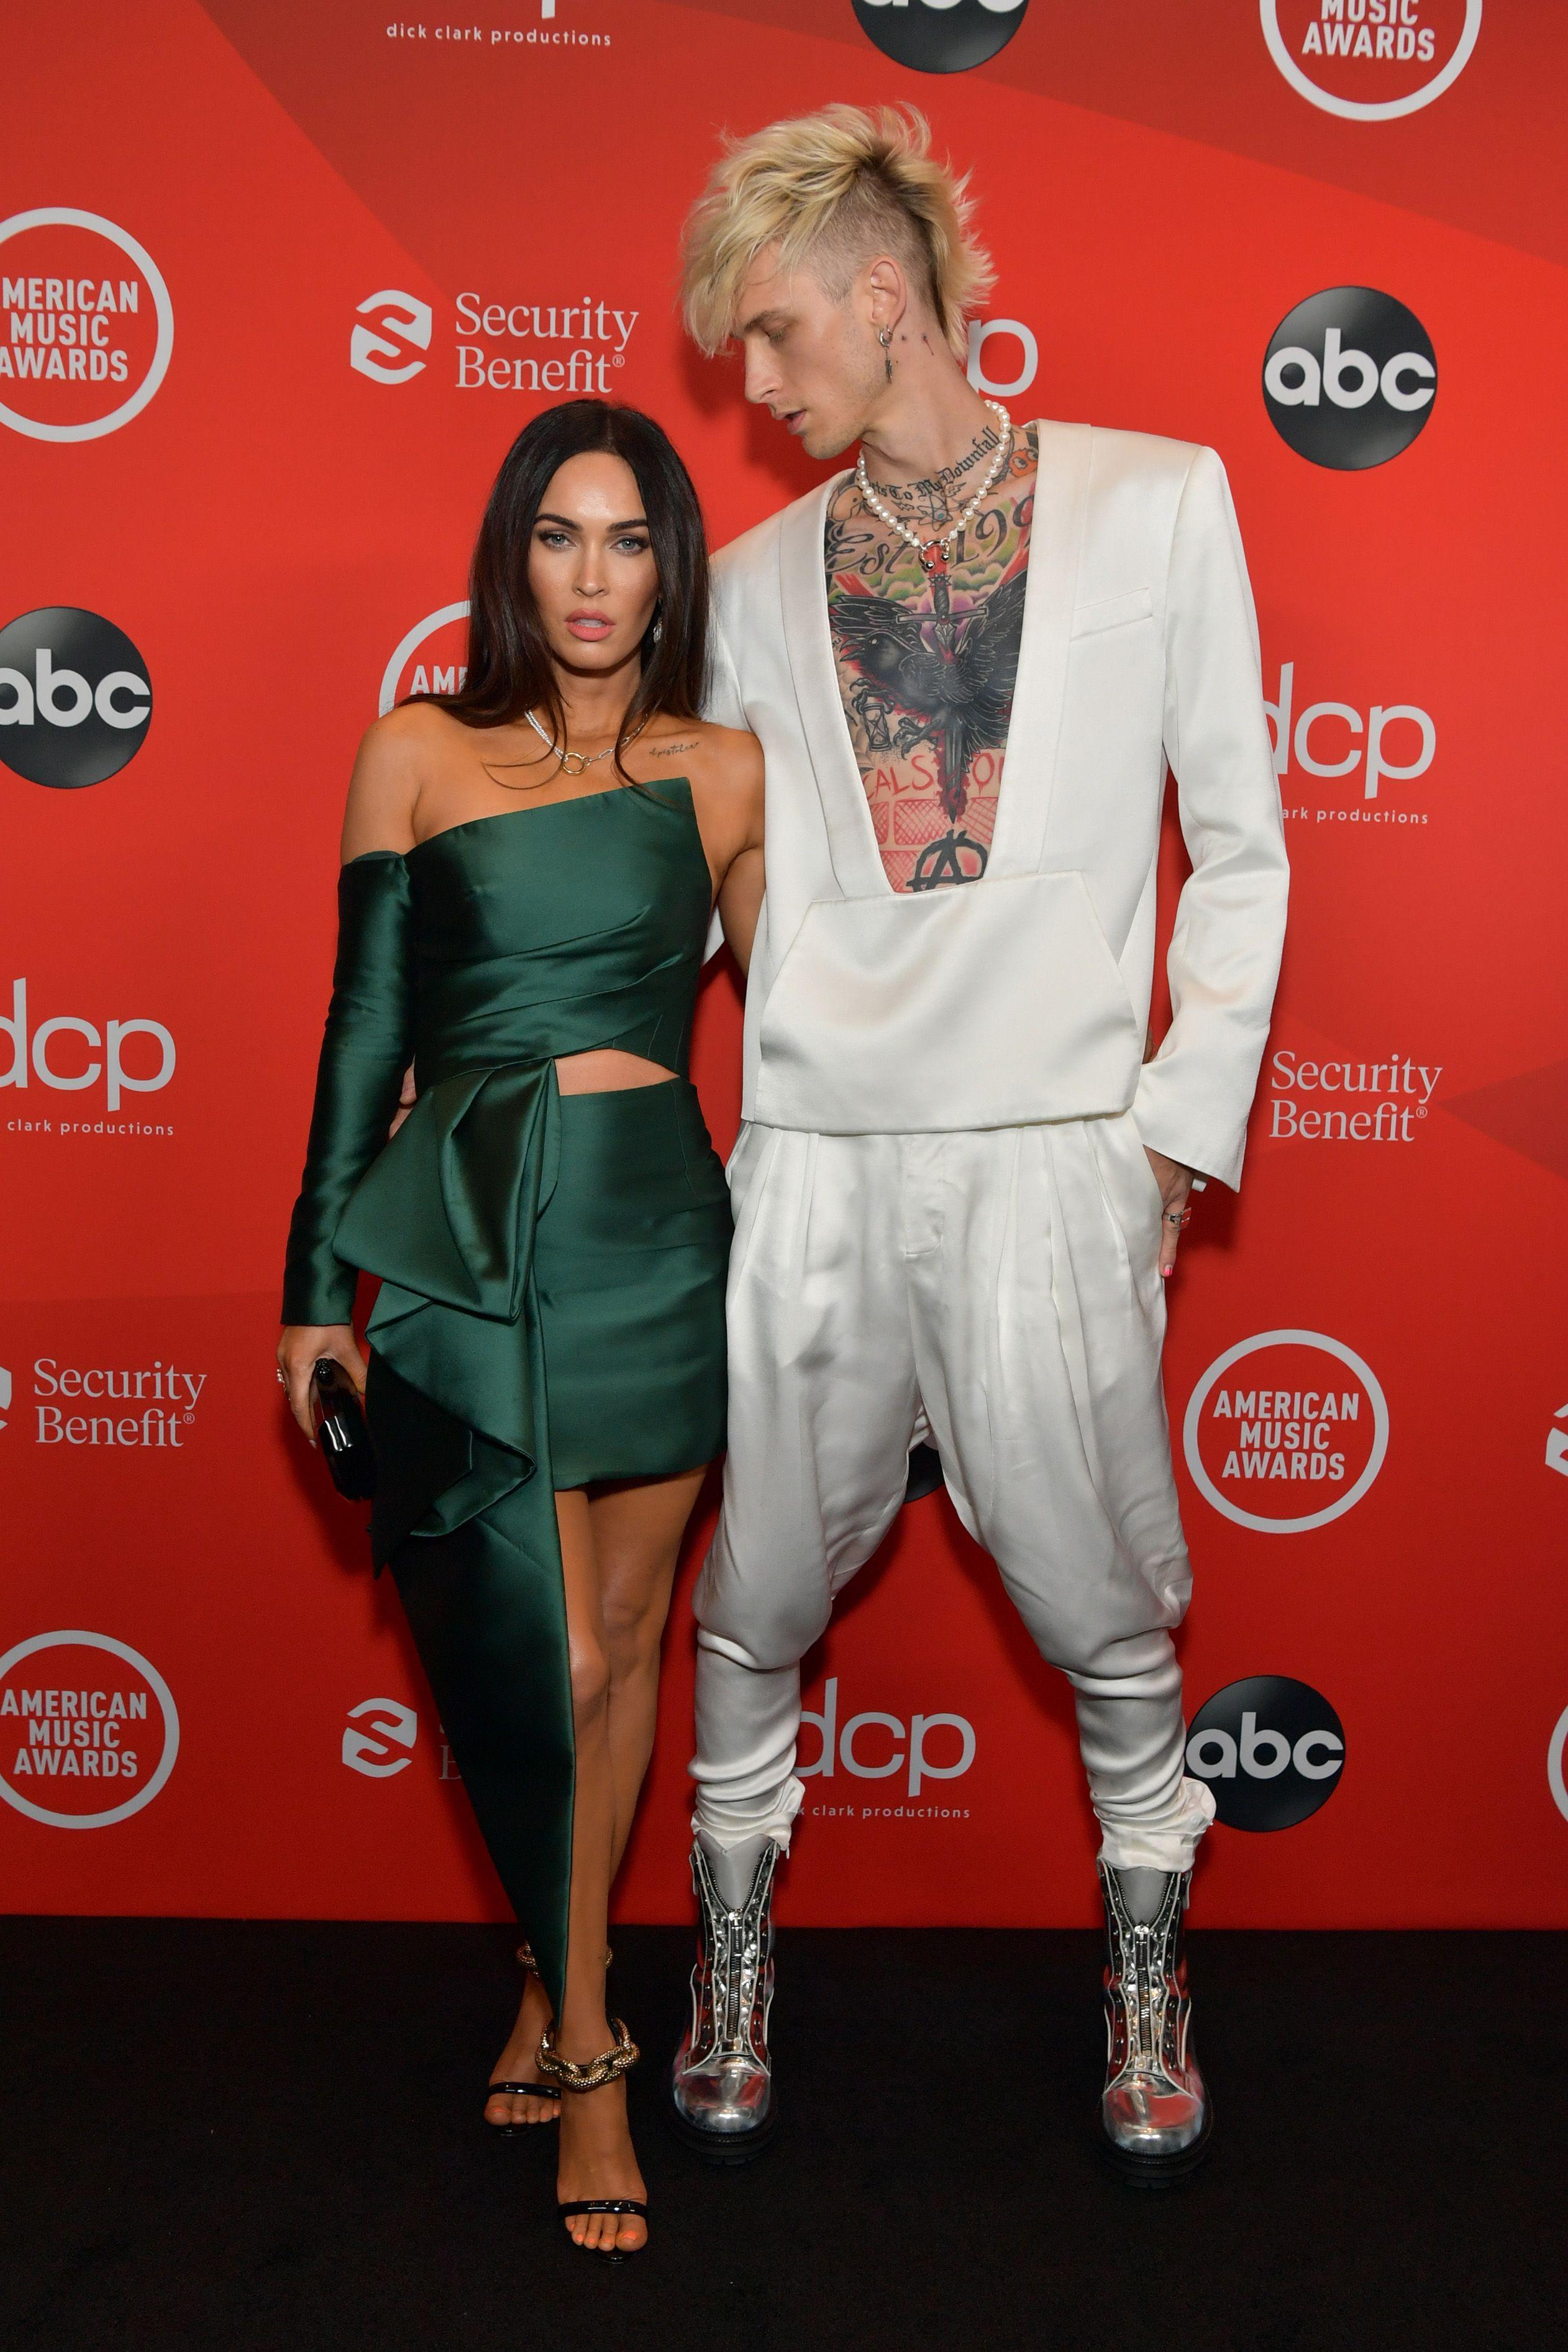 Megan Fox and Machine Gun Kelly Make Their Glitzy Red Carpet Debut at the 2020 AMAs